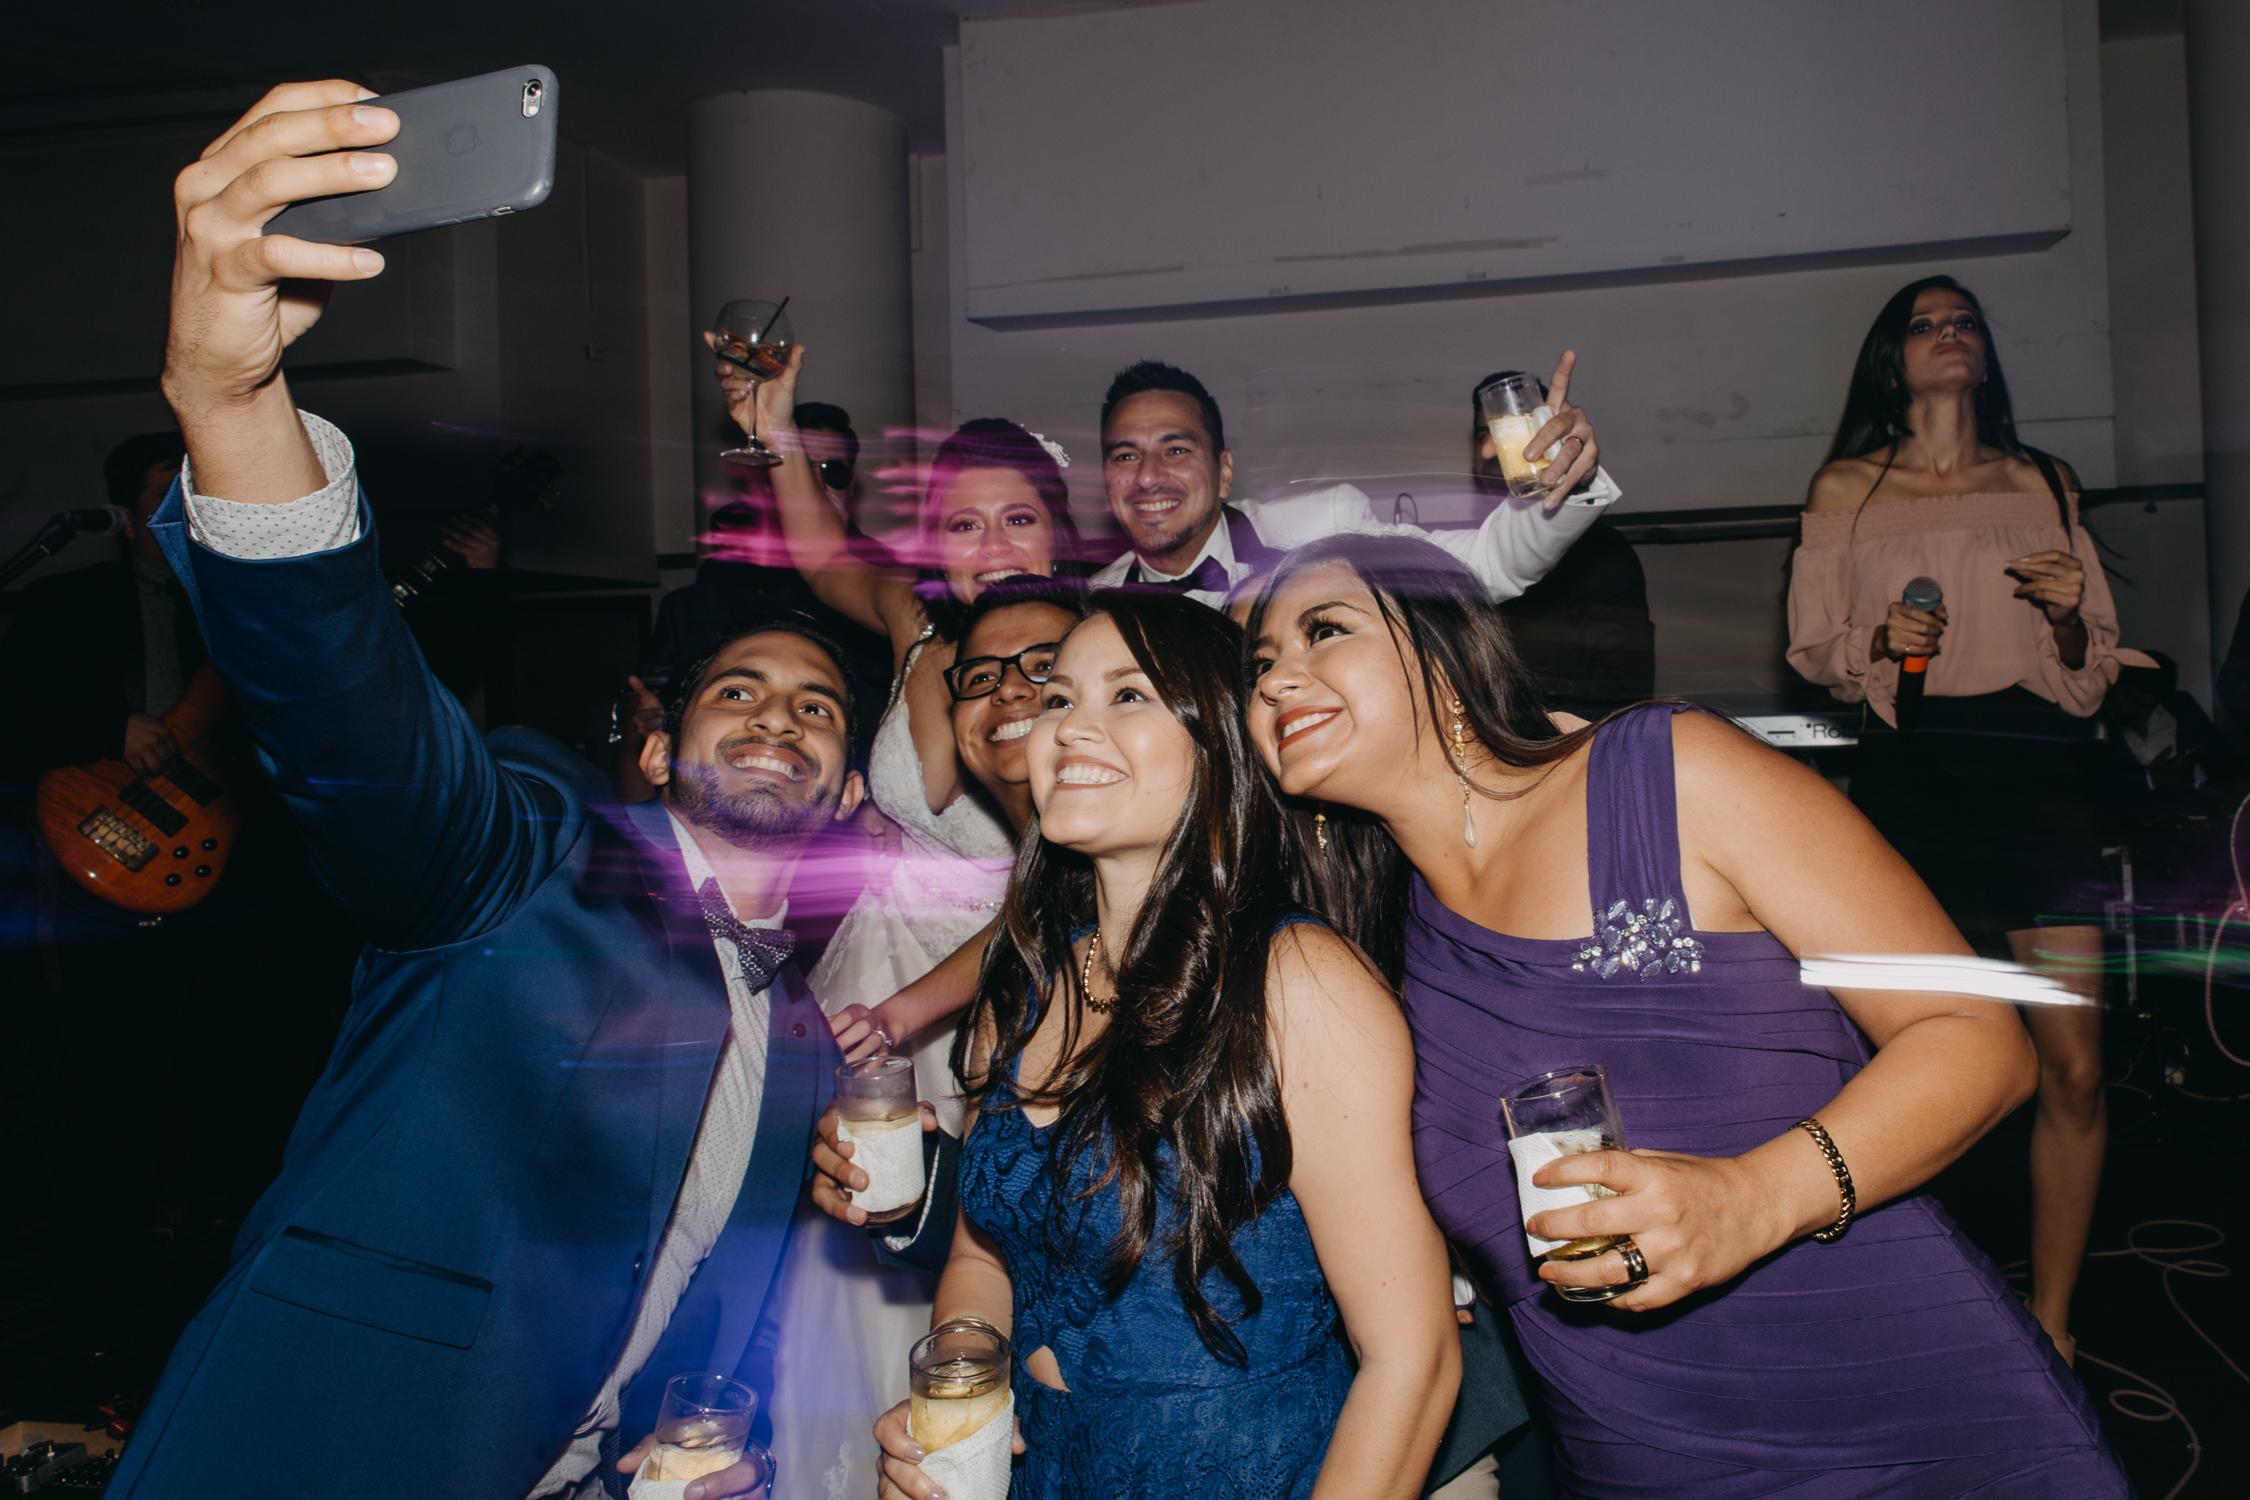 Michelle-Agurto-Fotografia-Bodas-Ecuador-Destination-Wedding-Photographer-Daniela-Dirk-72.JPG